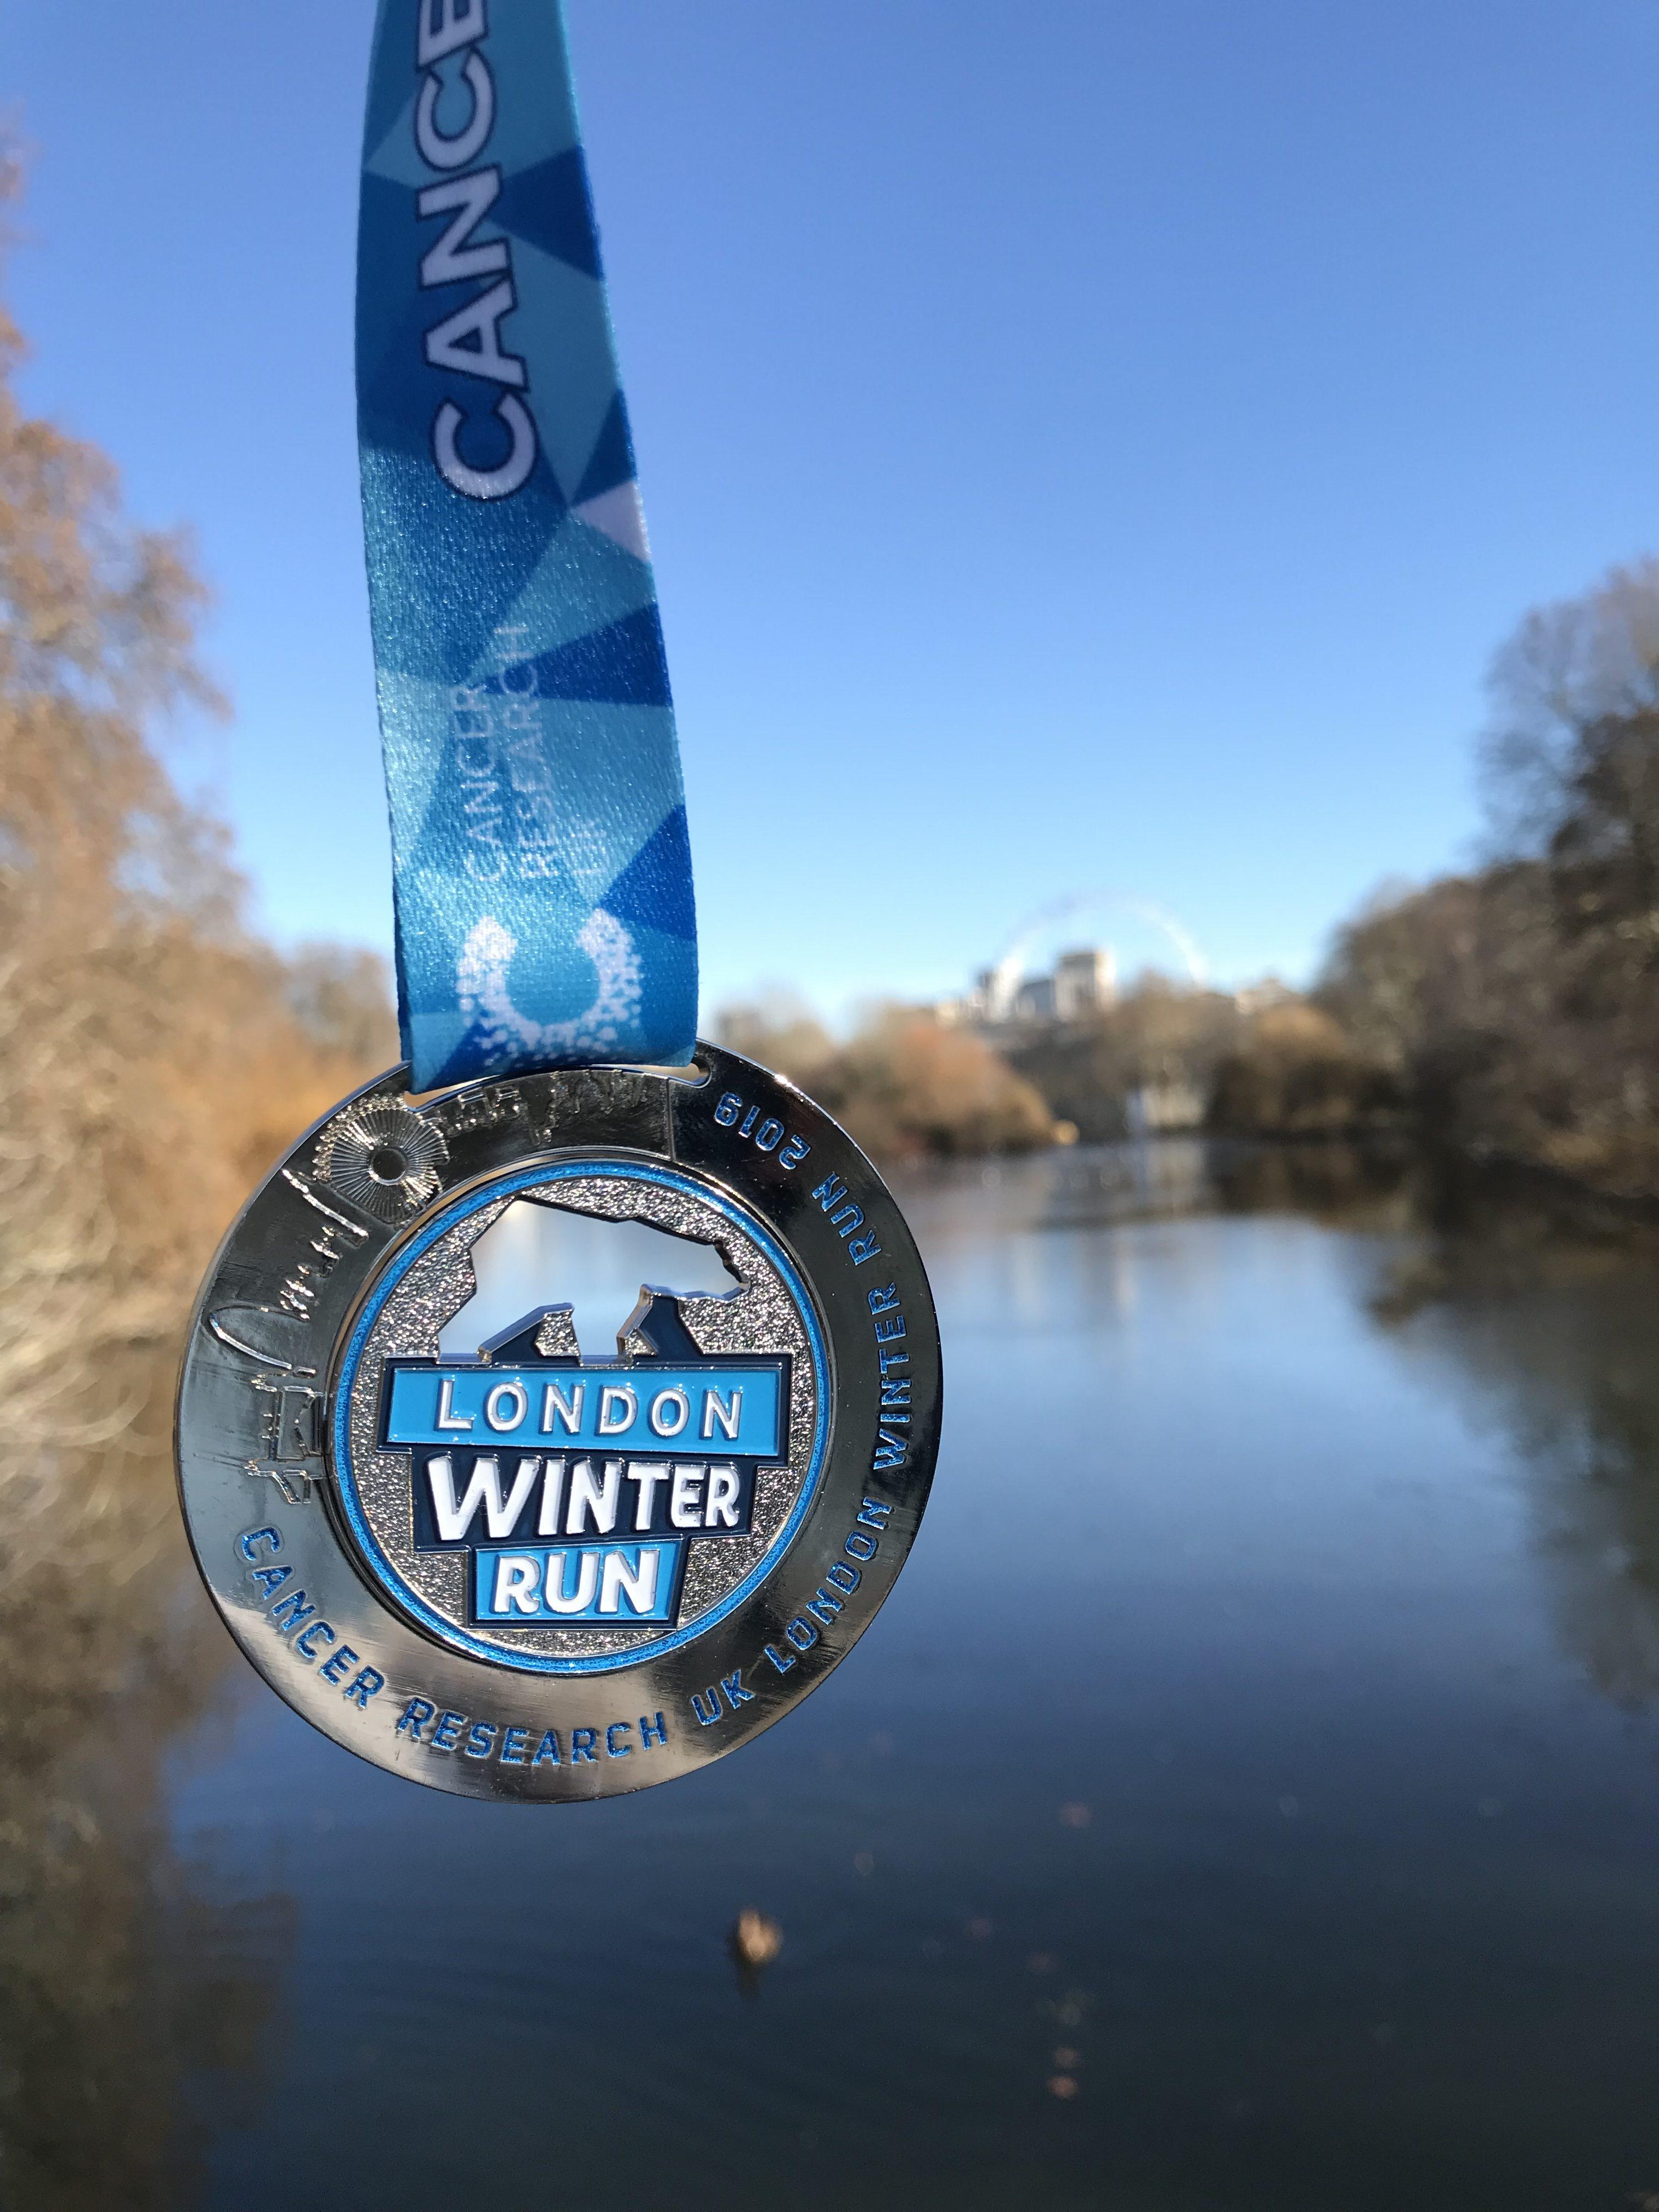 London Winter 10k Race Review